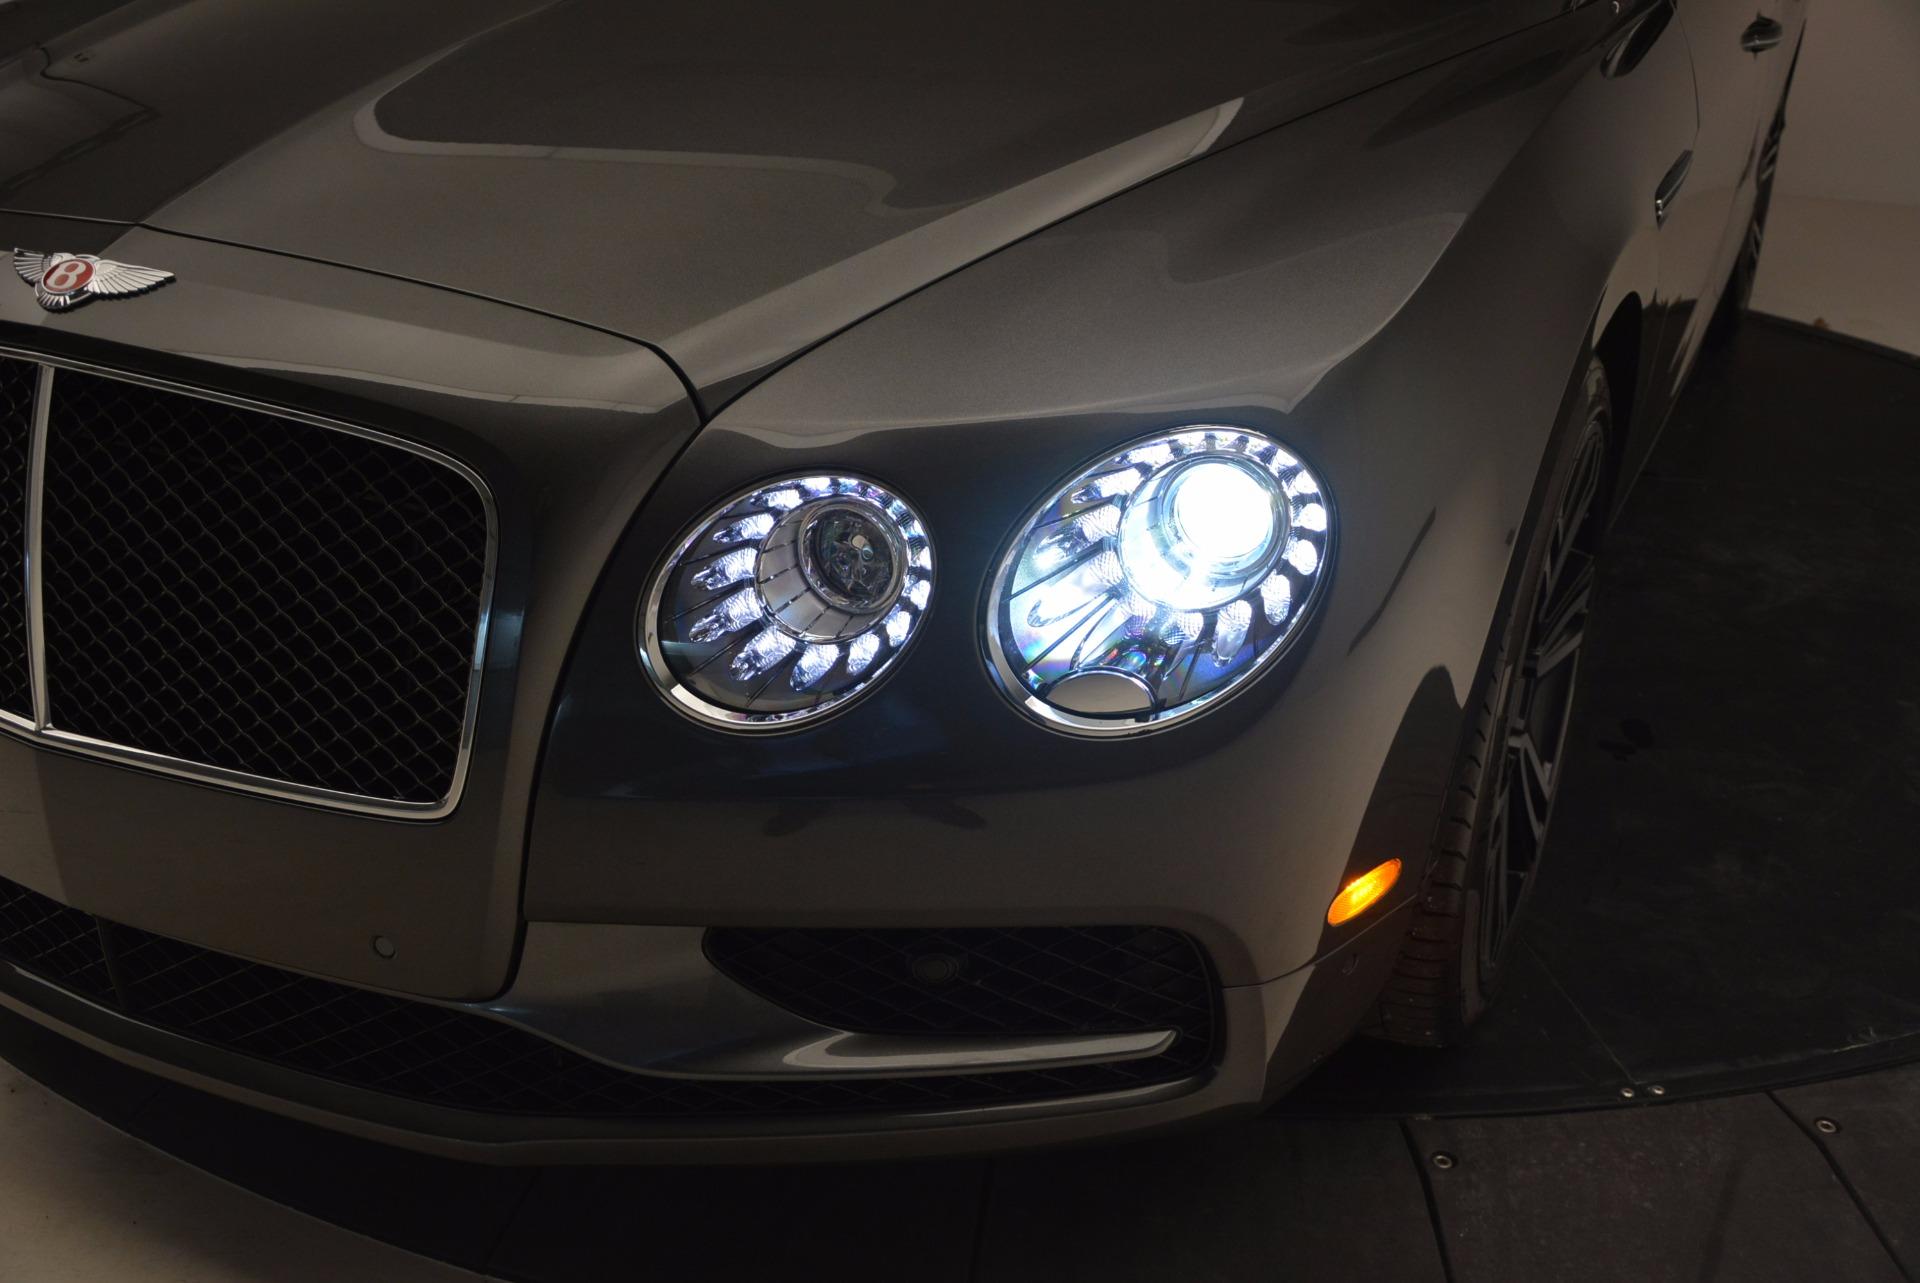 Used 2017 Bentley Flying Spur V8 S For Sale In Westport, CT 875_p17